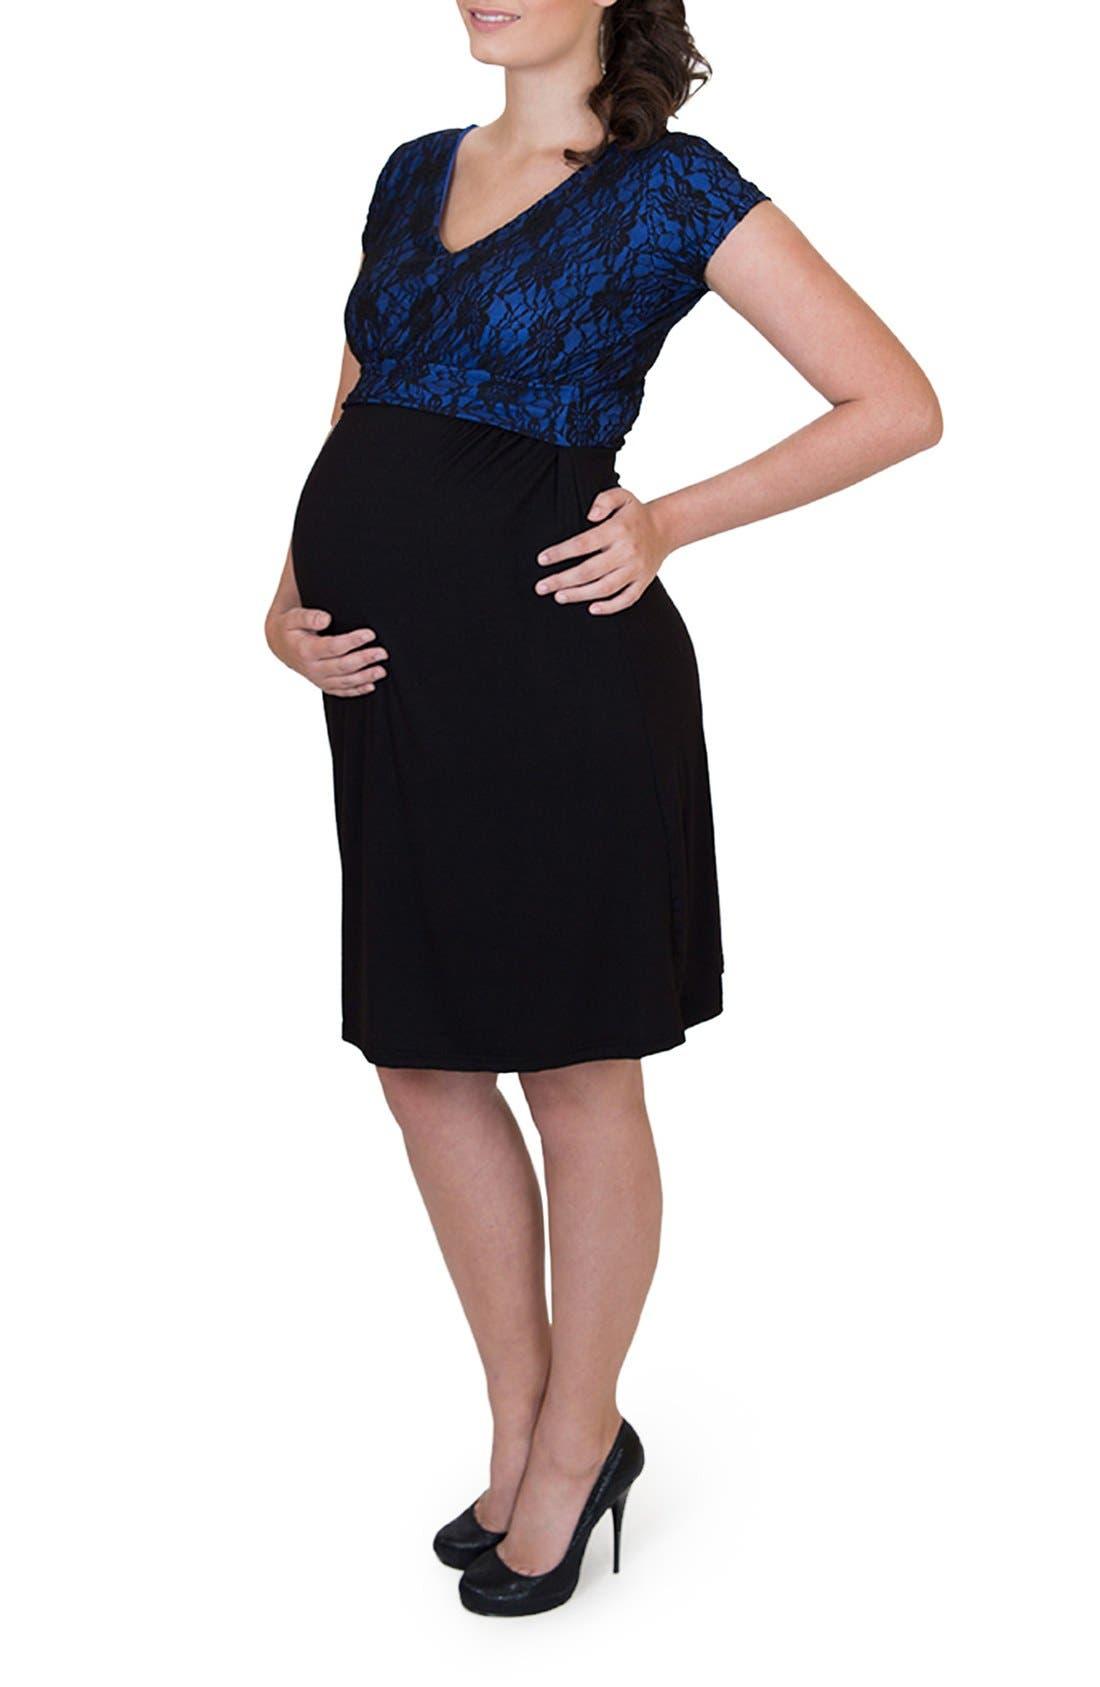 NURTURE-ELLE,                             'Camila' Maternity/Nursing Dress,                             Alternate thumbnail 3, color,                             421